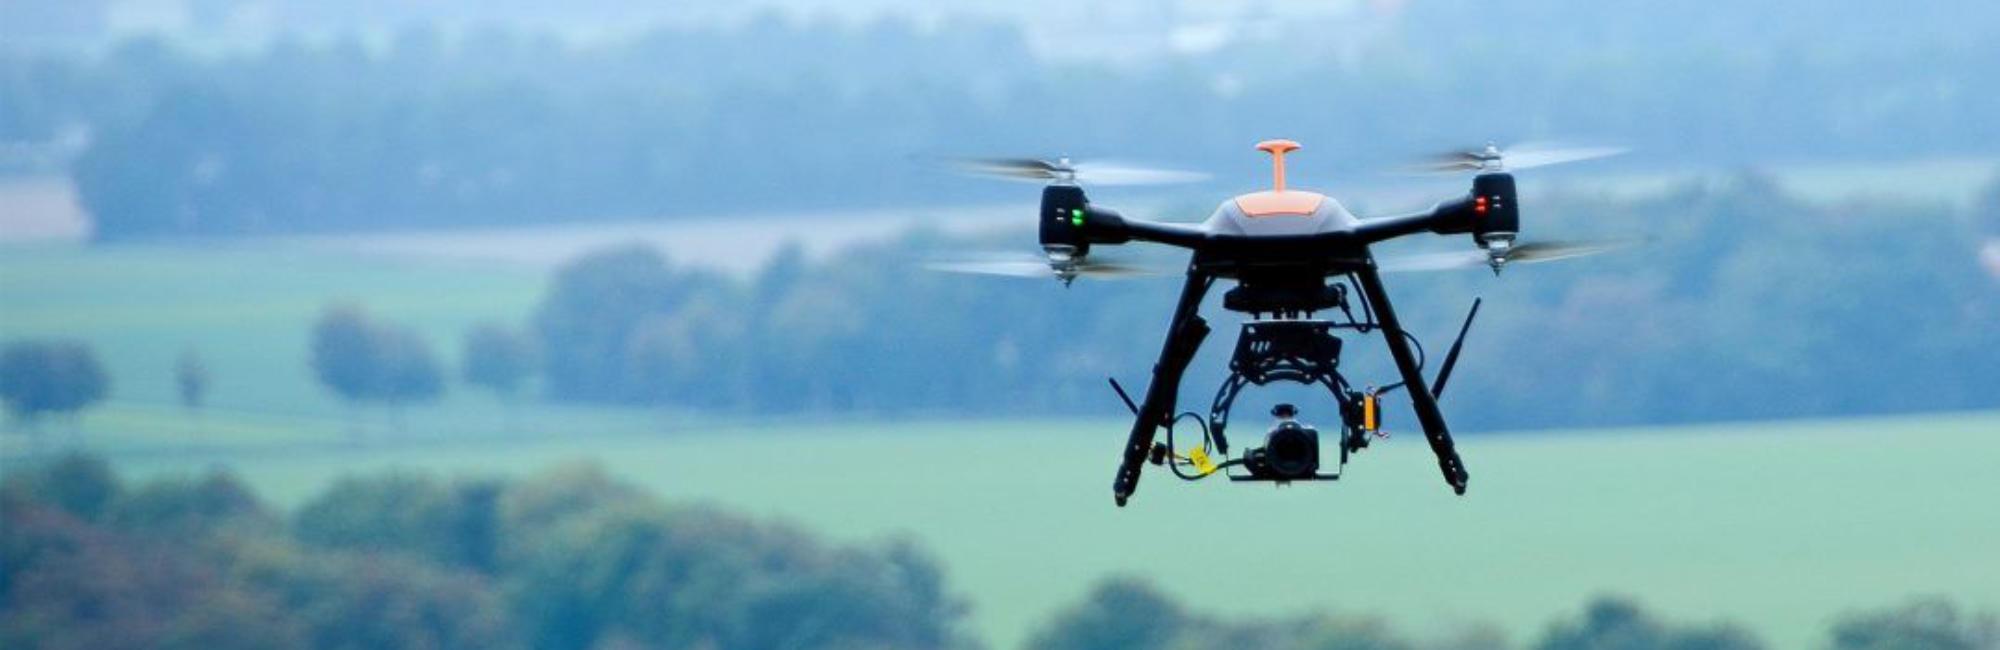 slide-2-drone2